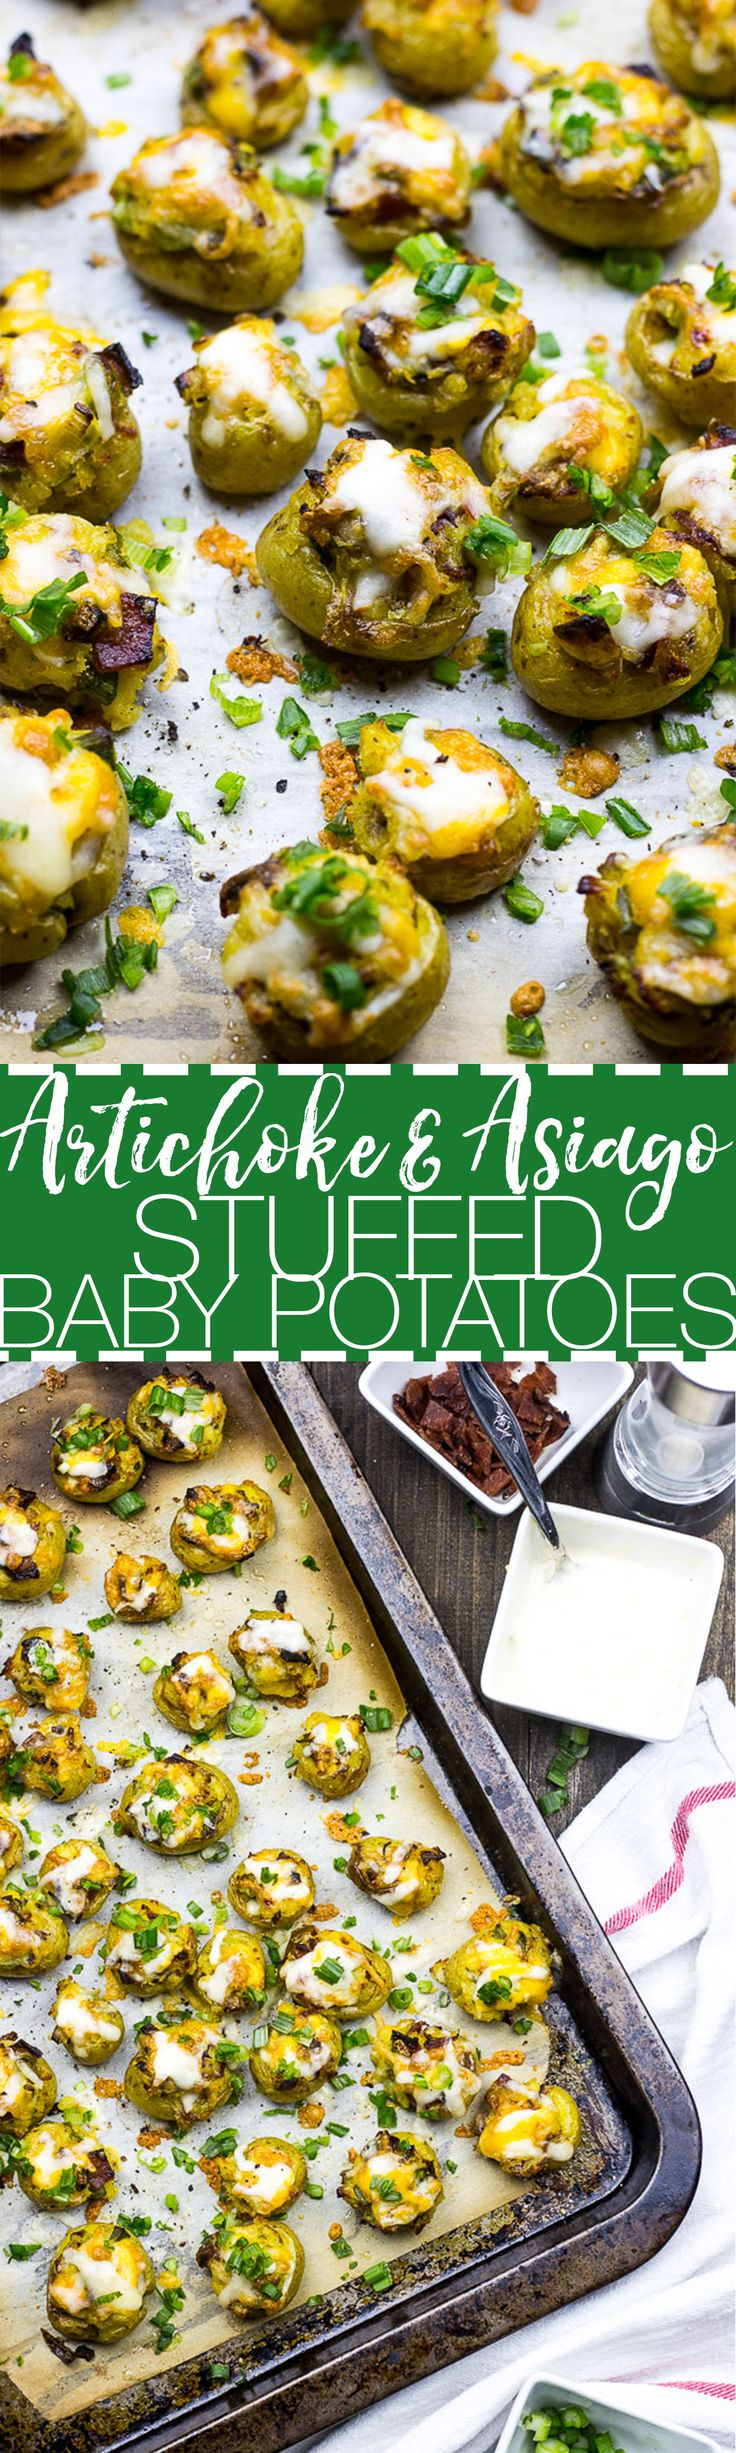 Artichoke & Asiago Stuffed Baby Potatoes | A bite-sized version of twice baked potatoes with bacon & scallions